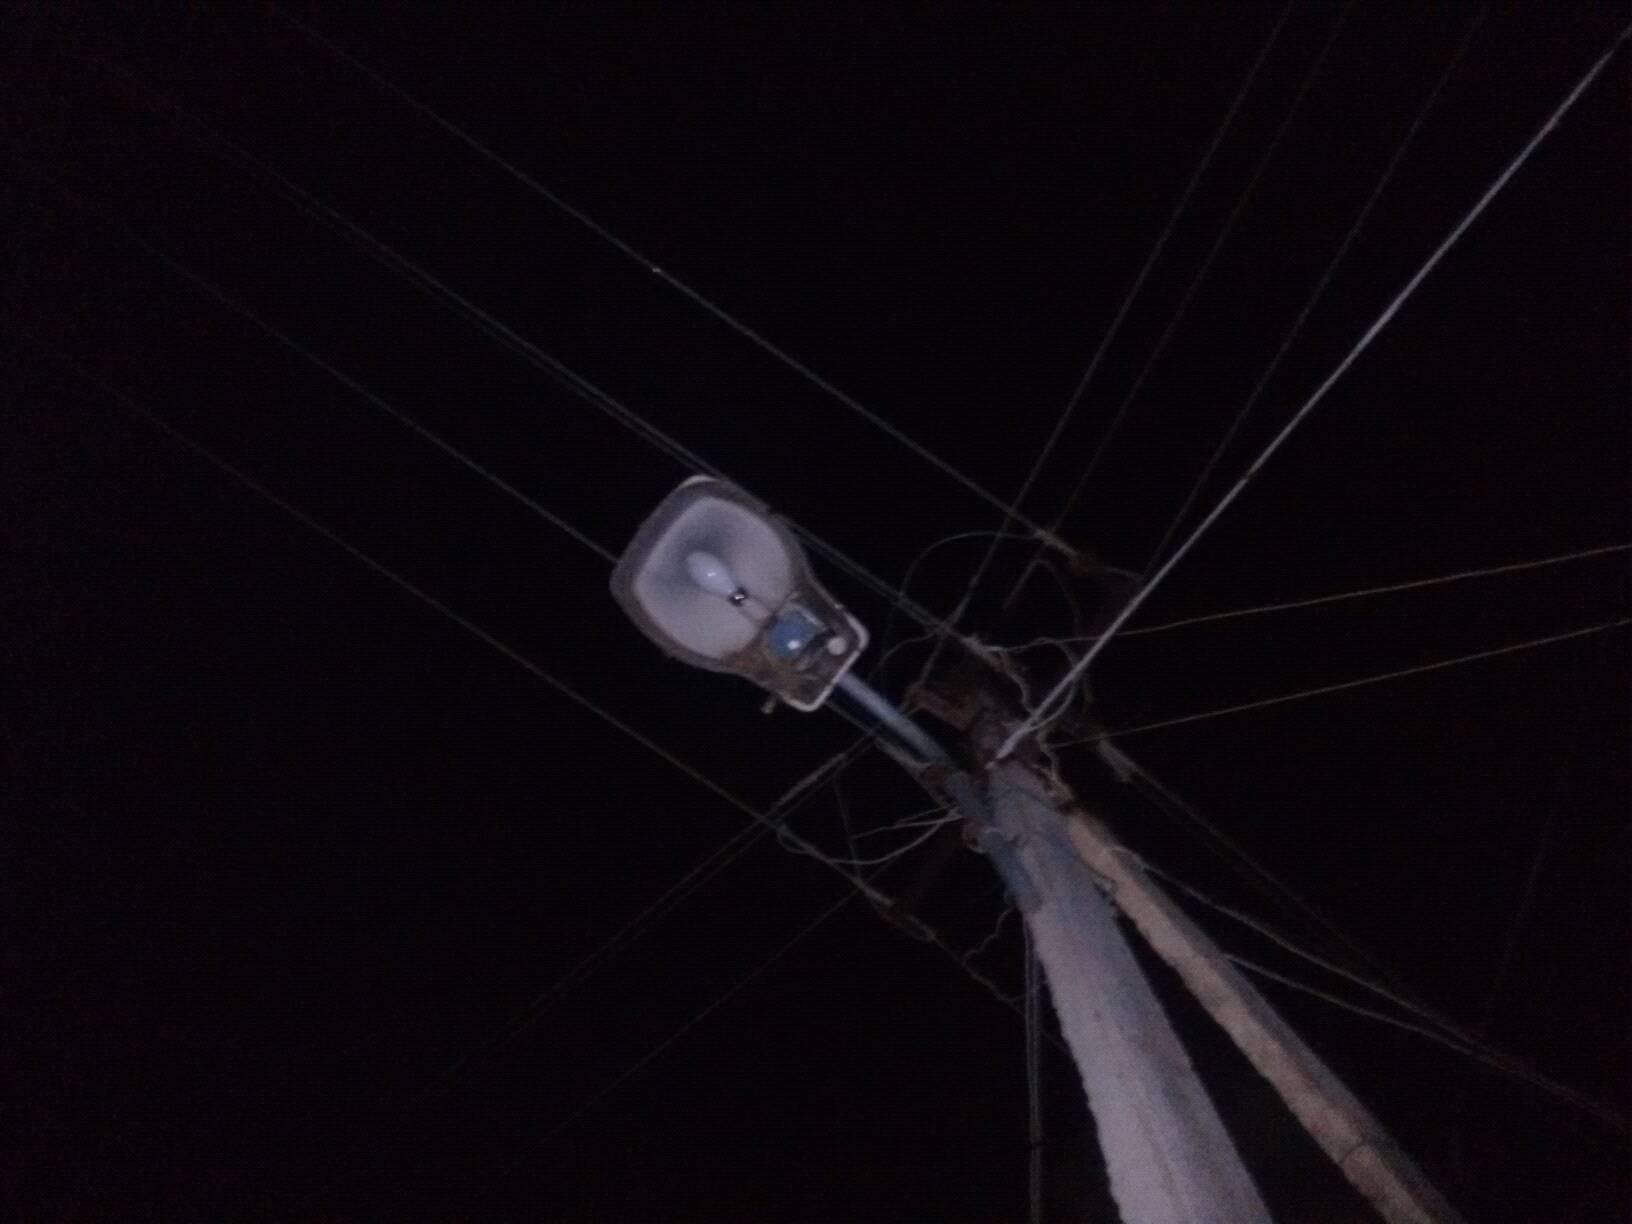 Kulasekarapatti Panchayat Street Light